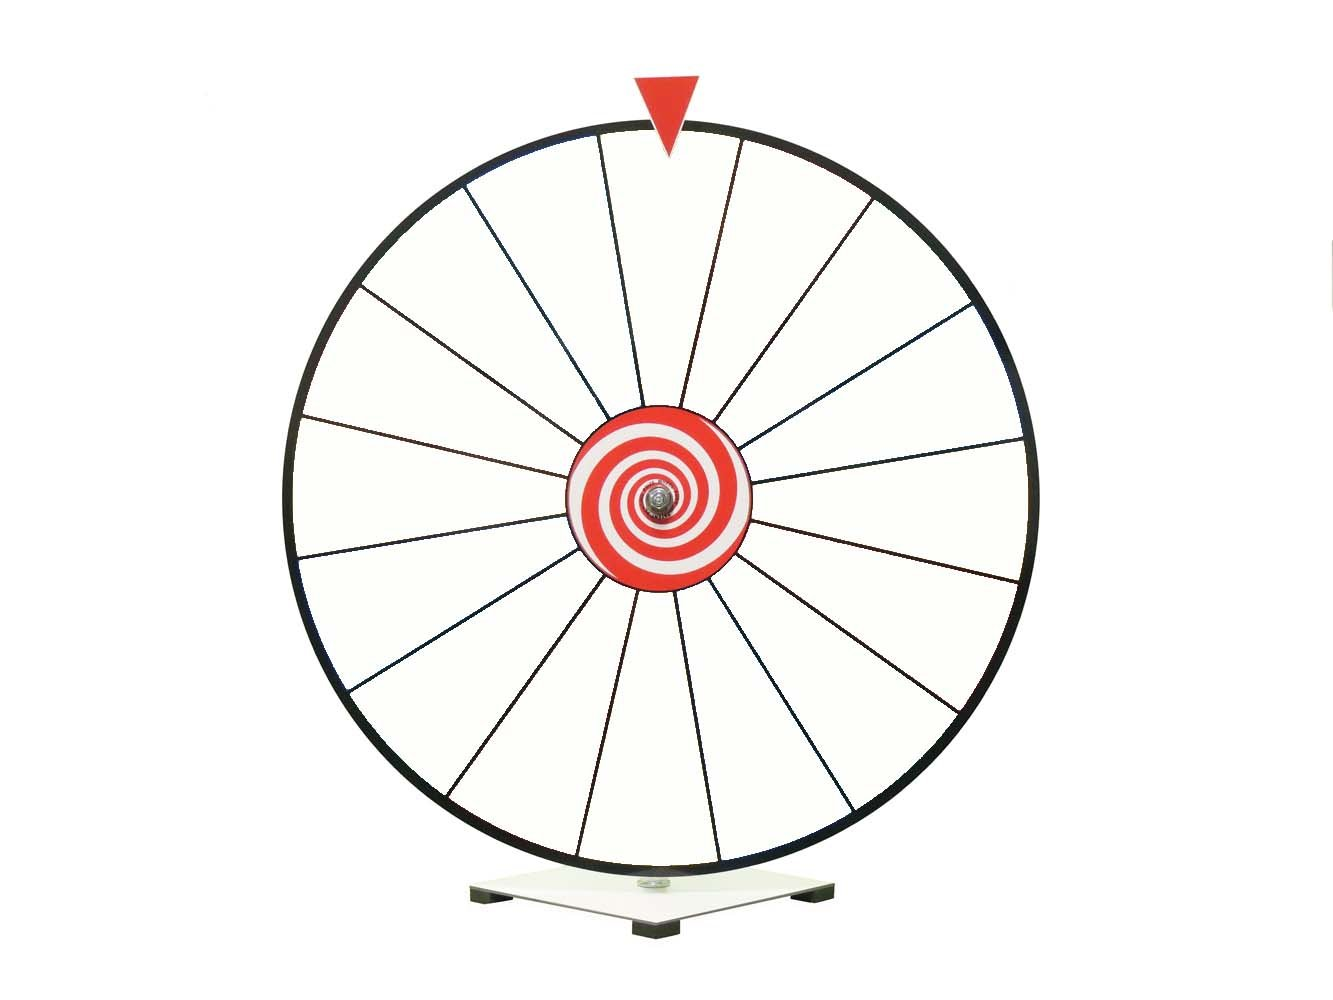 24 Inch Dry Erase Spinning Prize Wheel White Face Kid Safe Pegless Design